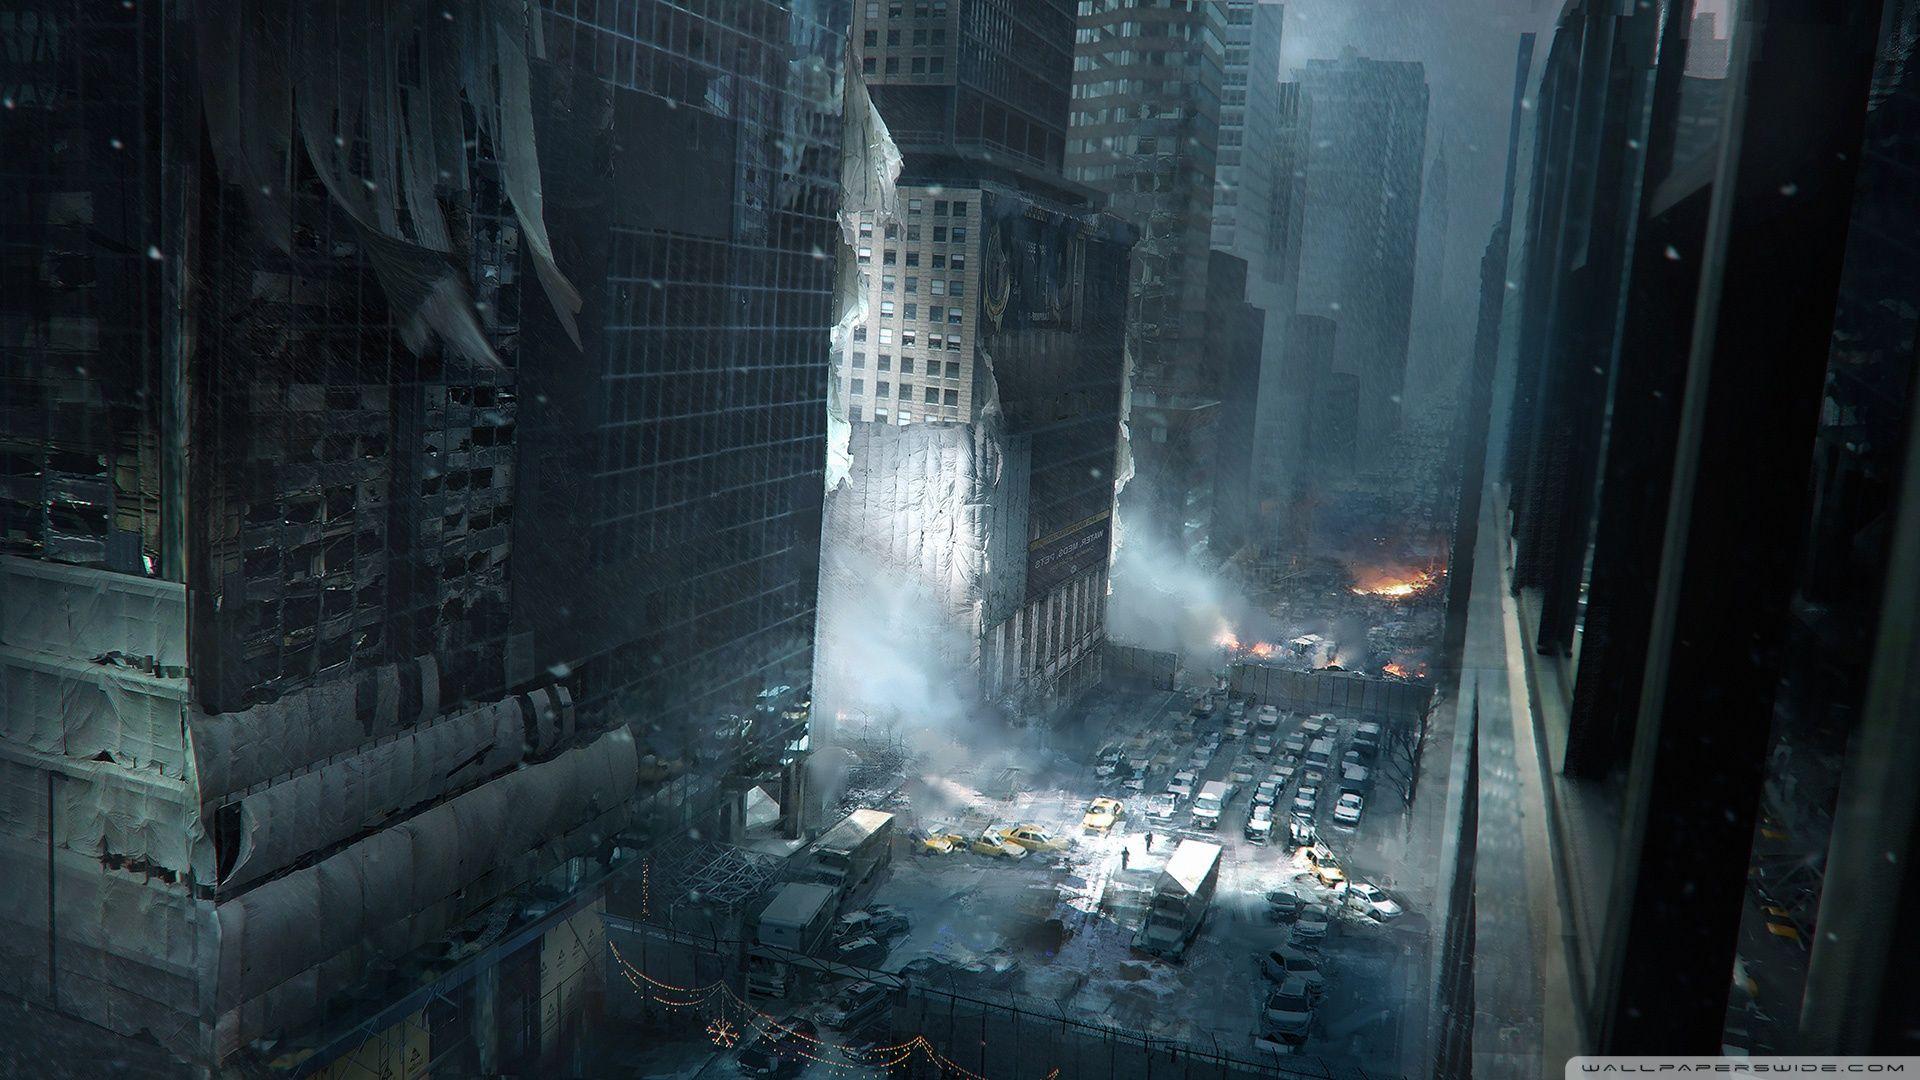 Pin by František Vangor on post apocalypse | Tom clancy, Tom clancy